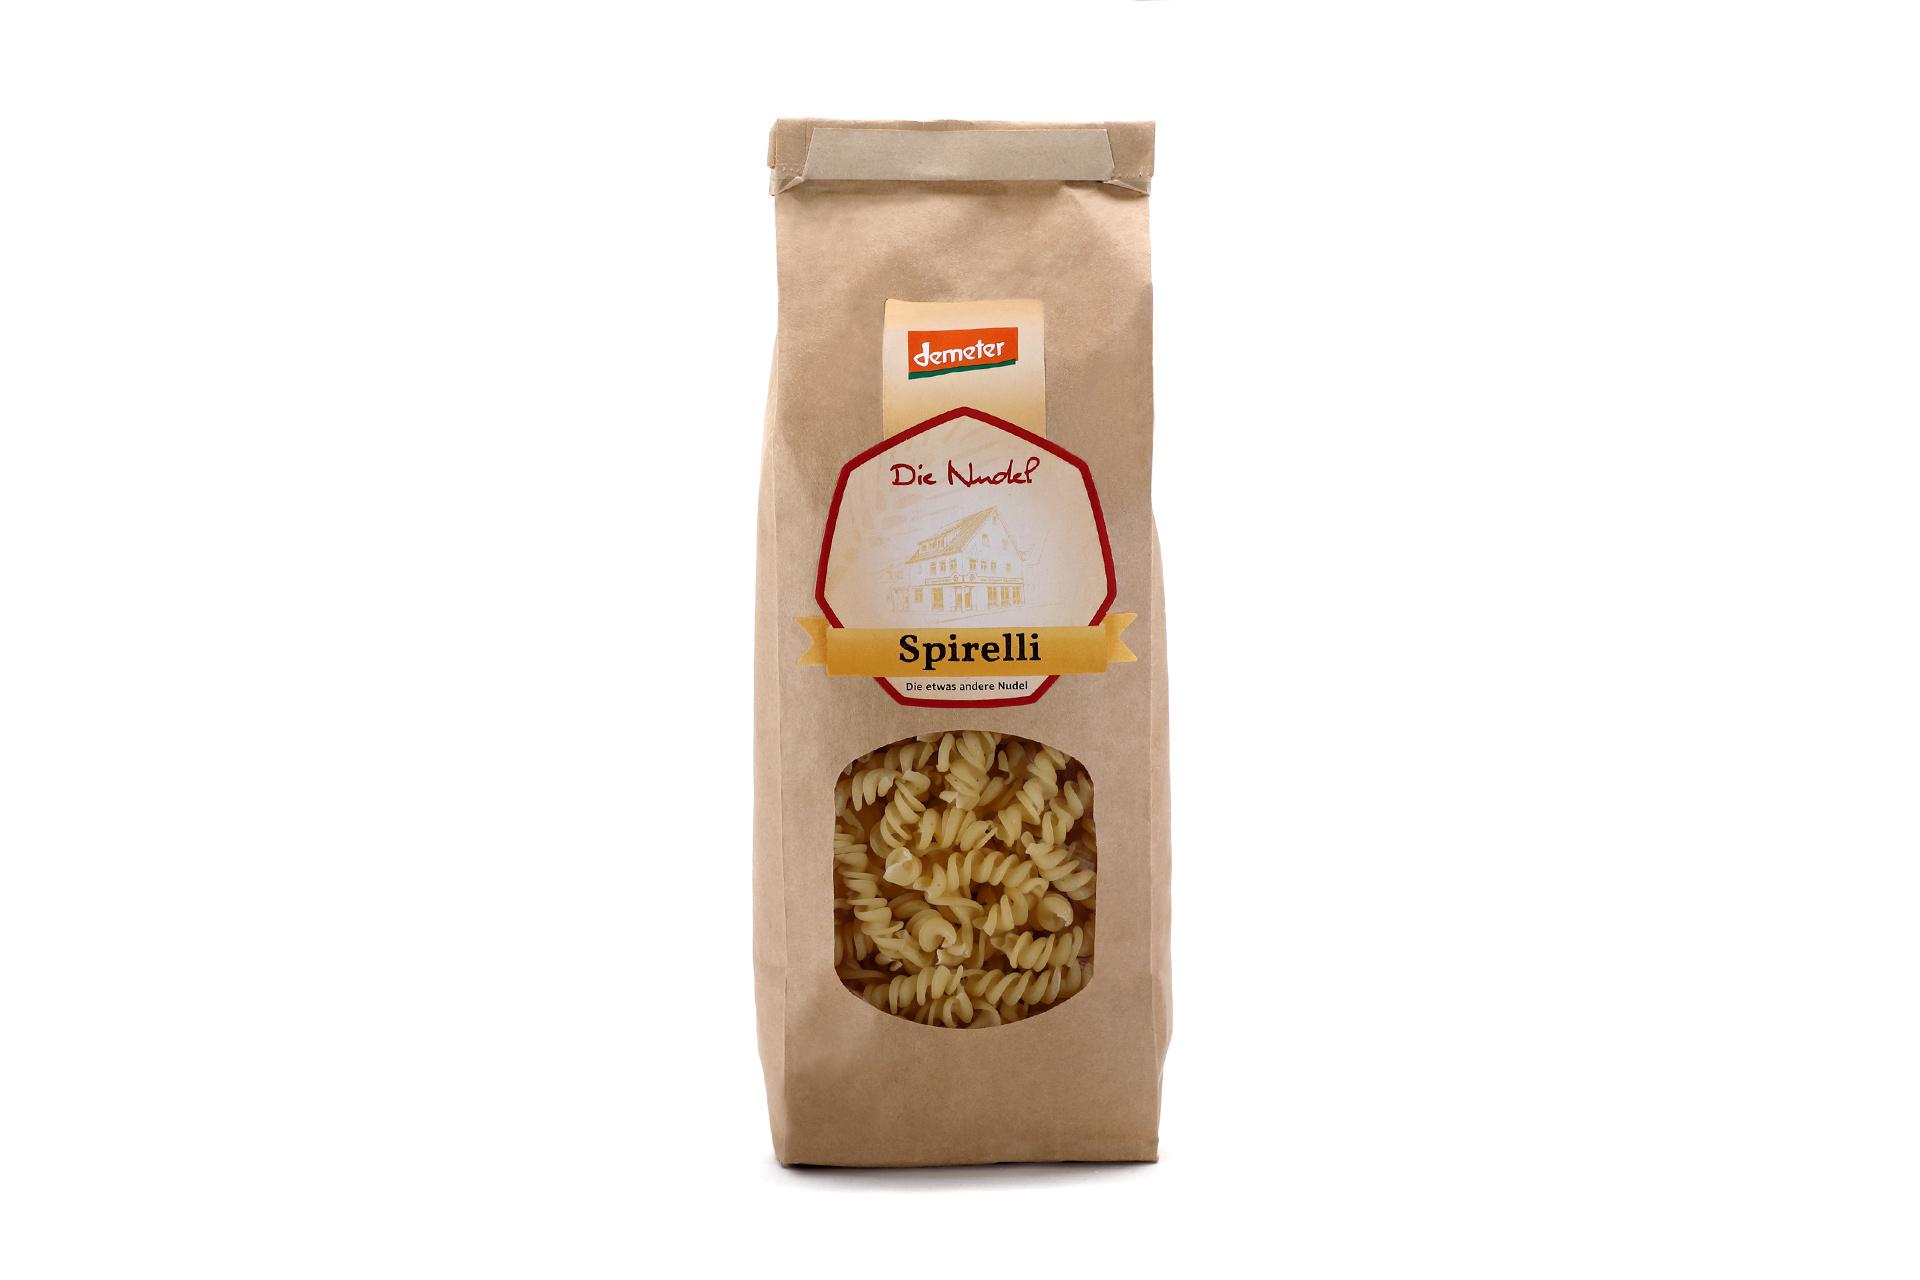 Spirelli-250-Hartweizengriess-Bio-Verpackung-